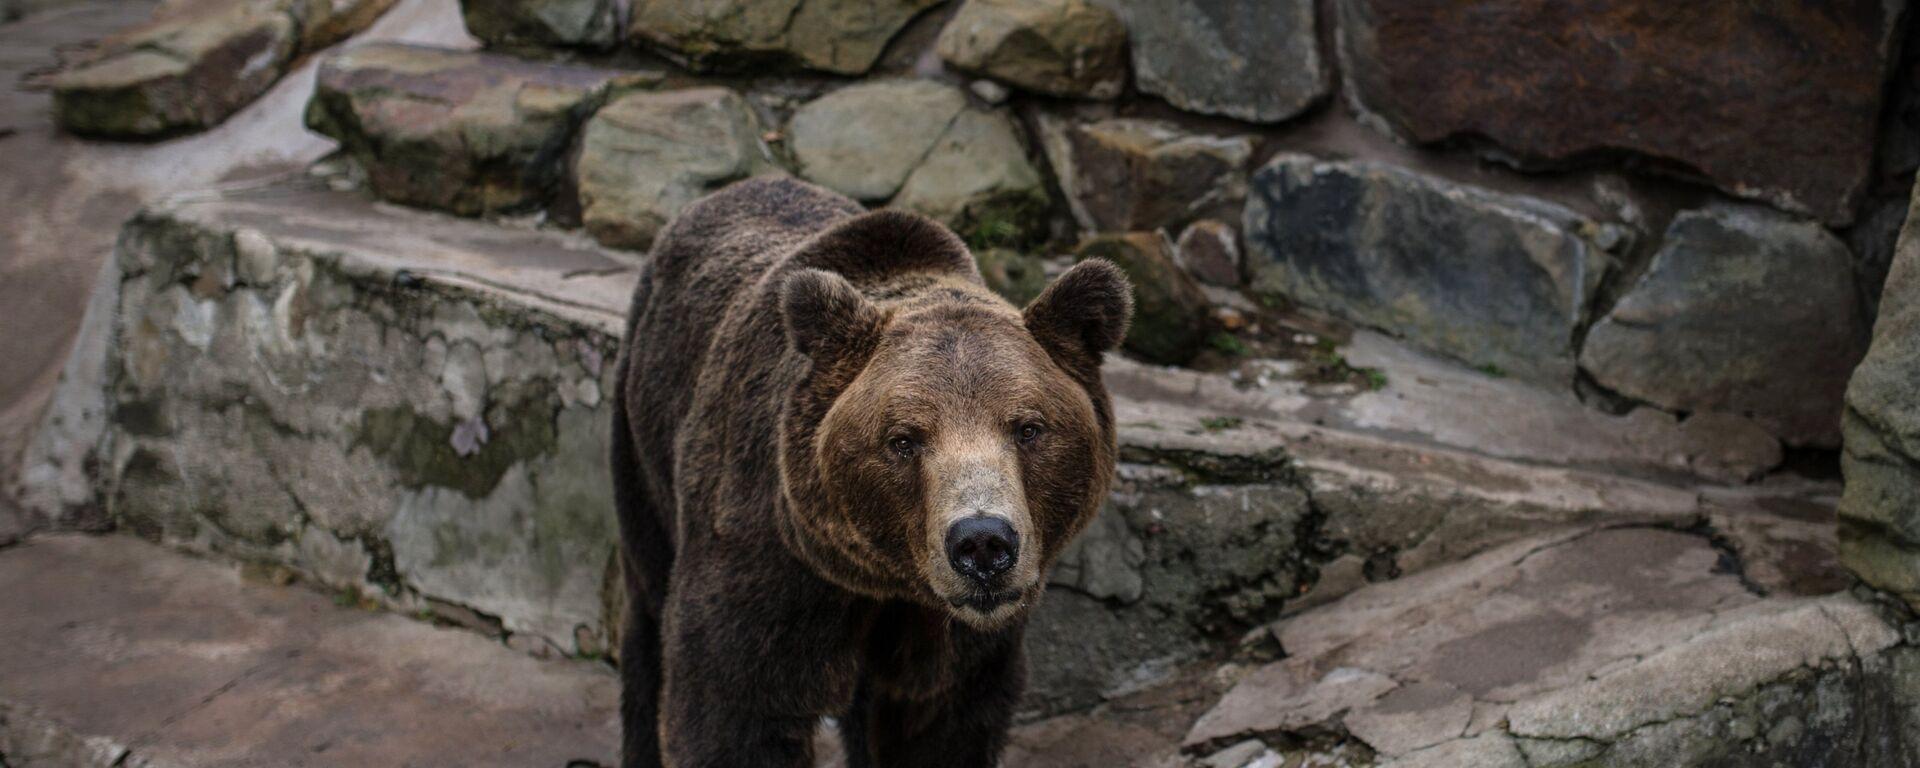 Бурый медведь, архивное фото - Sputnik Тоҷикистон, 1920, 20.07.2019